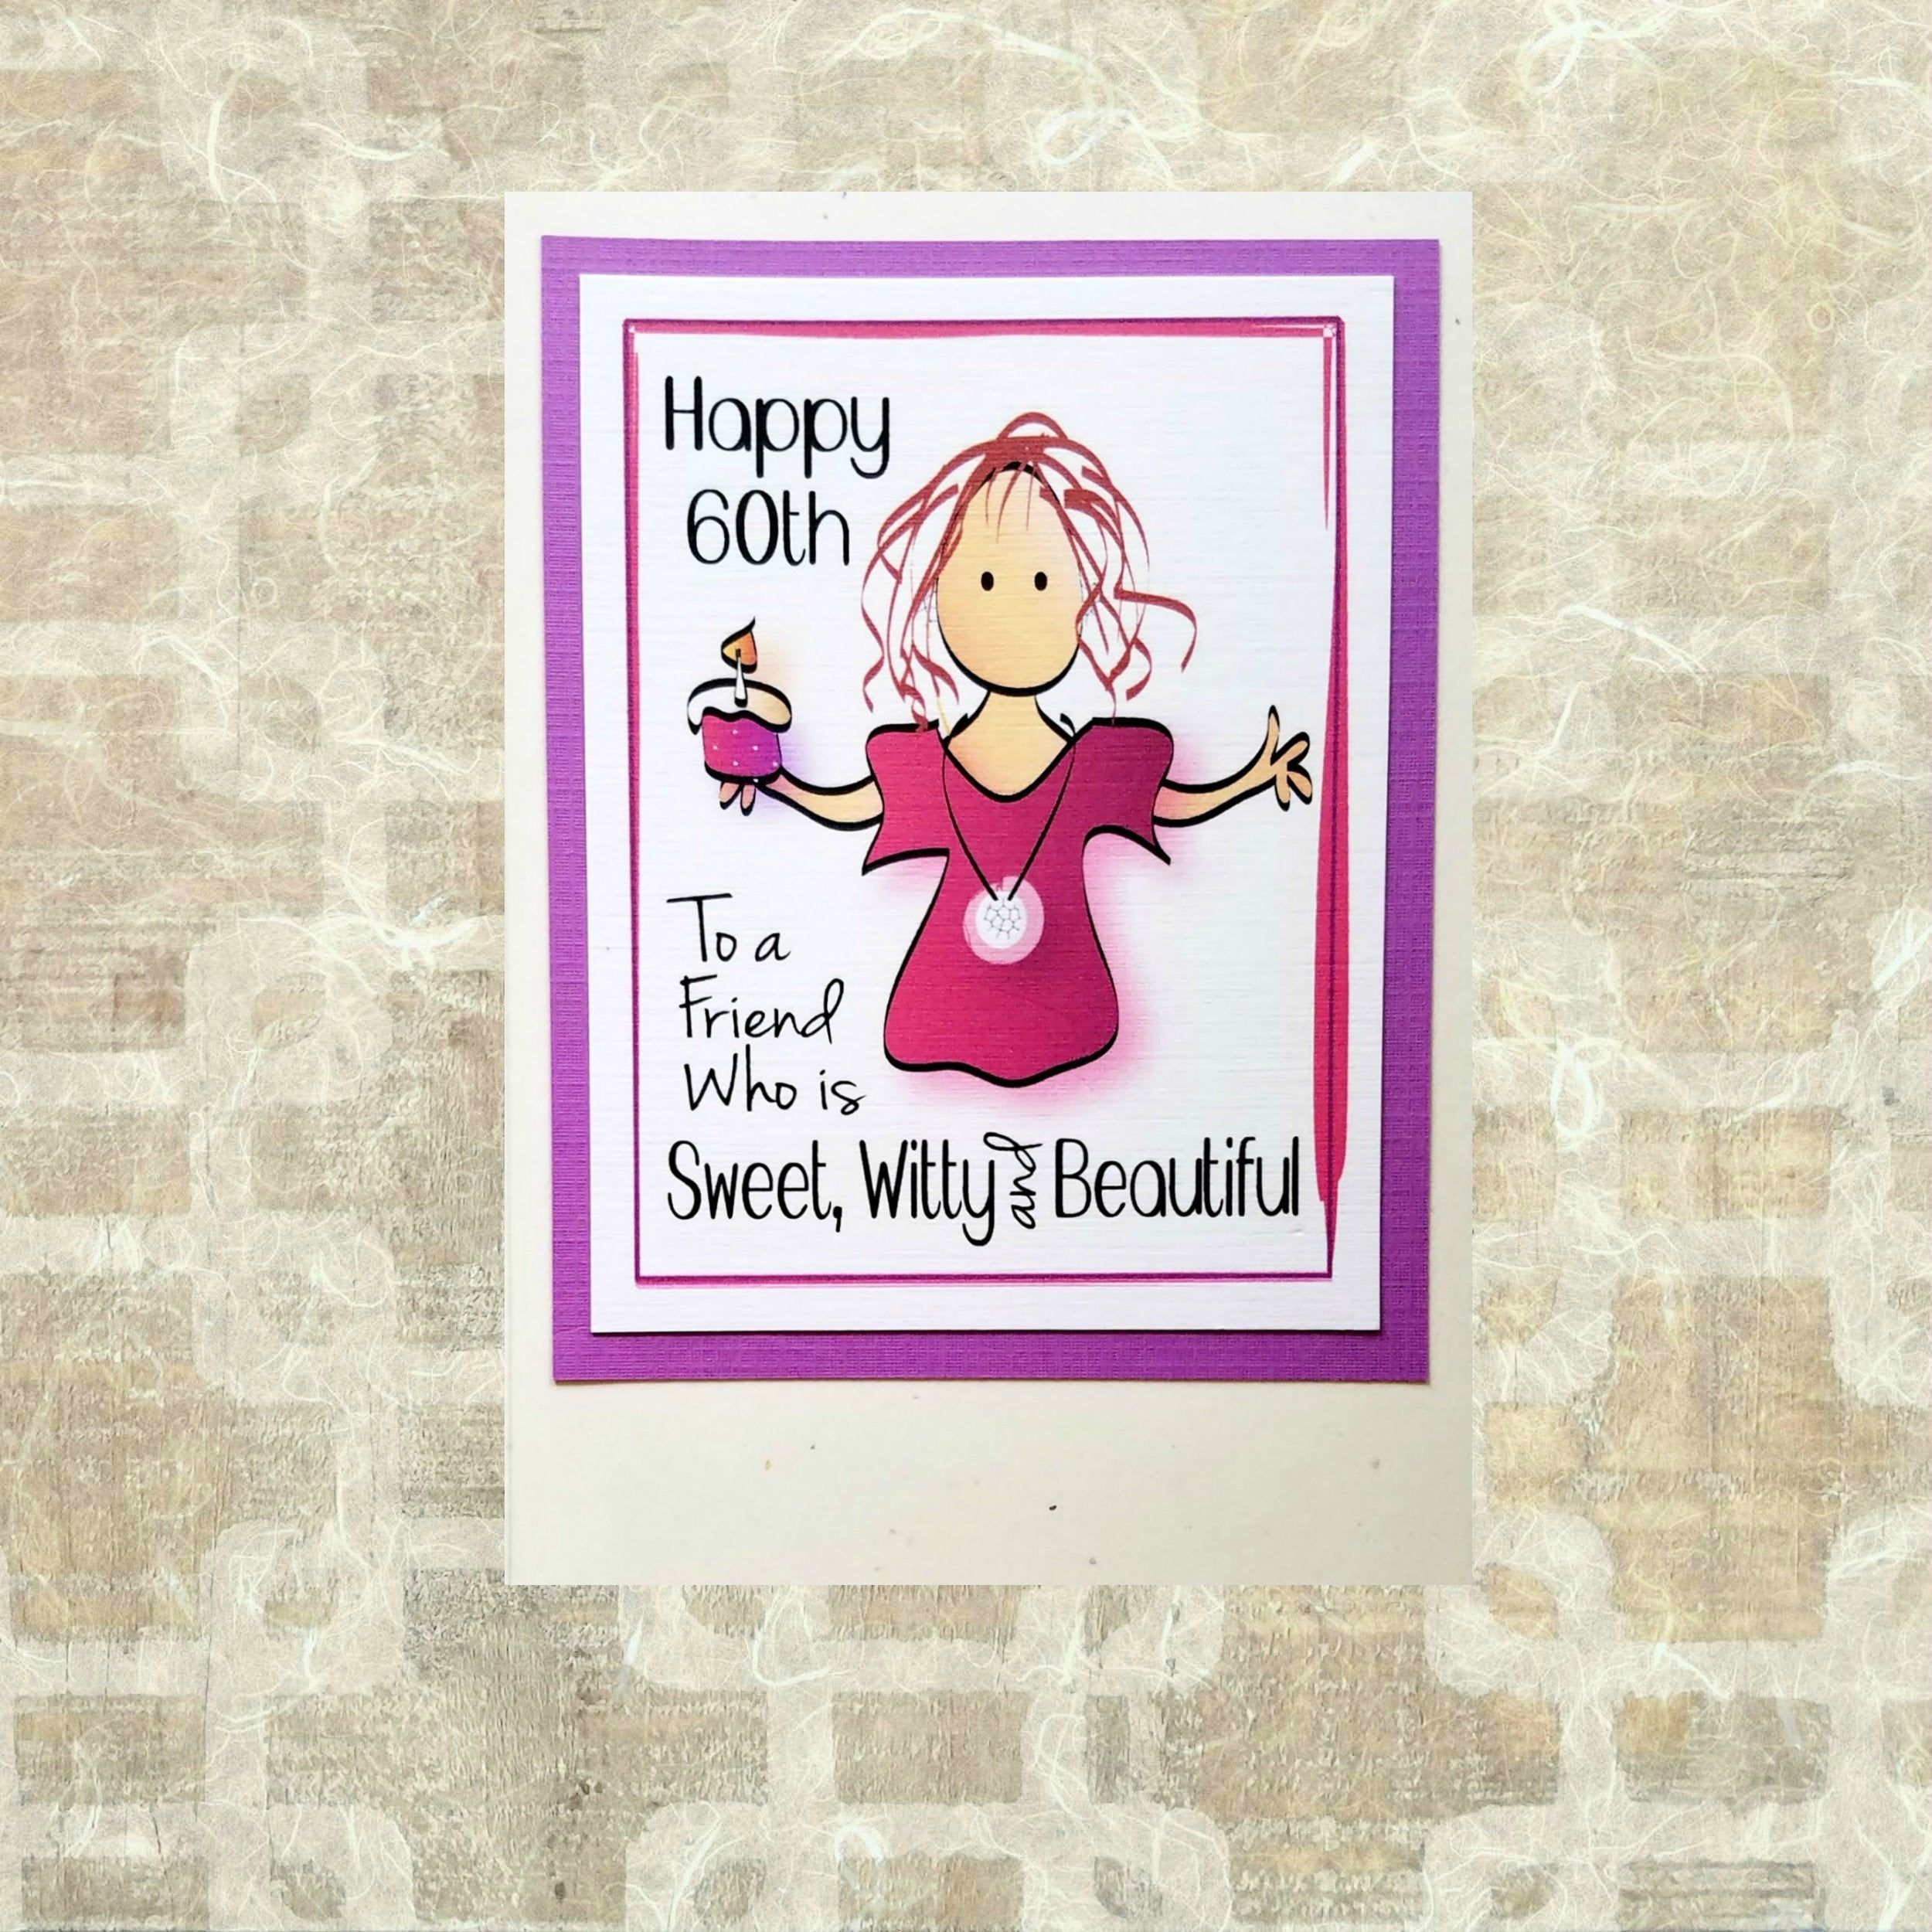 60th Birthday Card For Women Snarky Birthday Card For Her Etsy In 2021 60th Birthday Cards Birthday Cards For Her Birthday Cards For Women